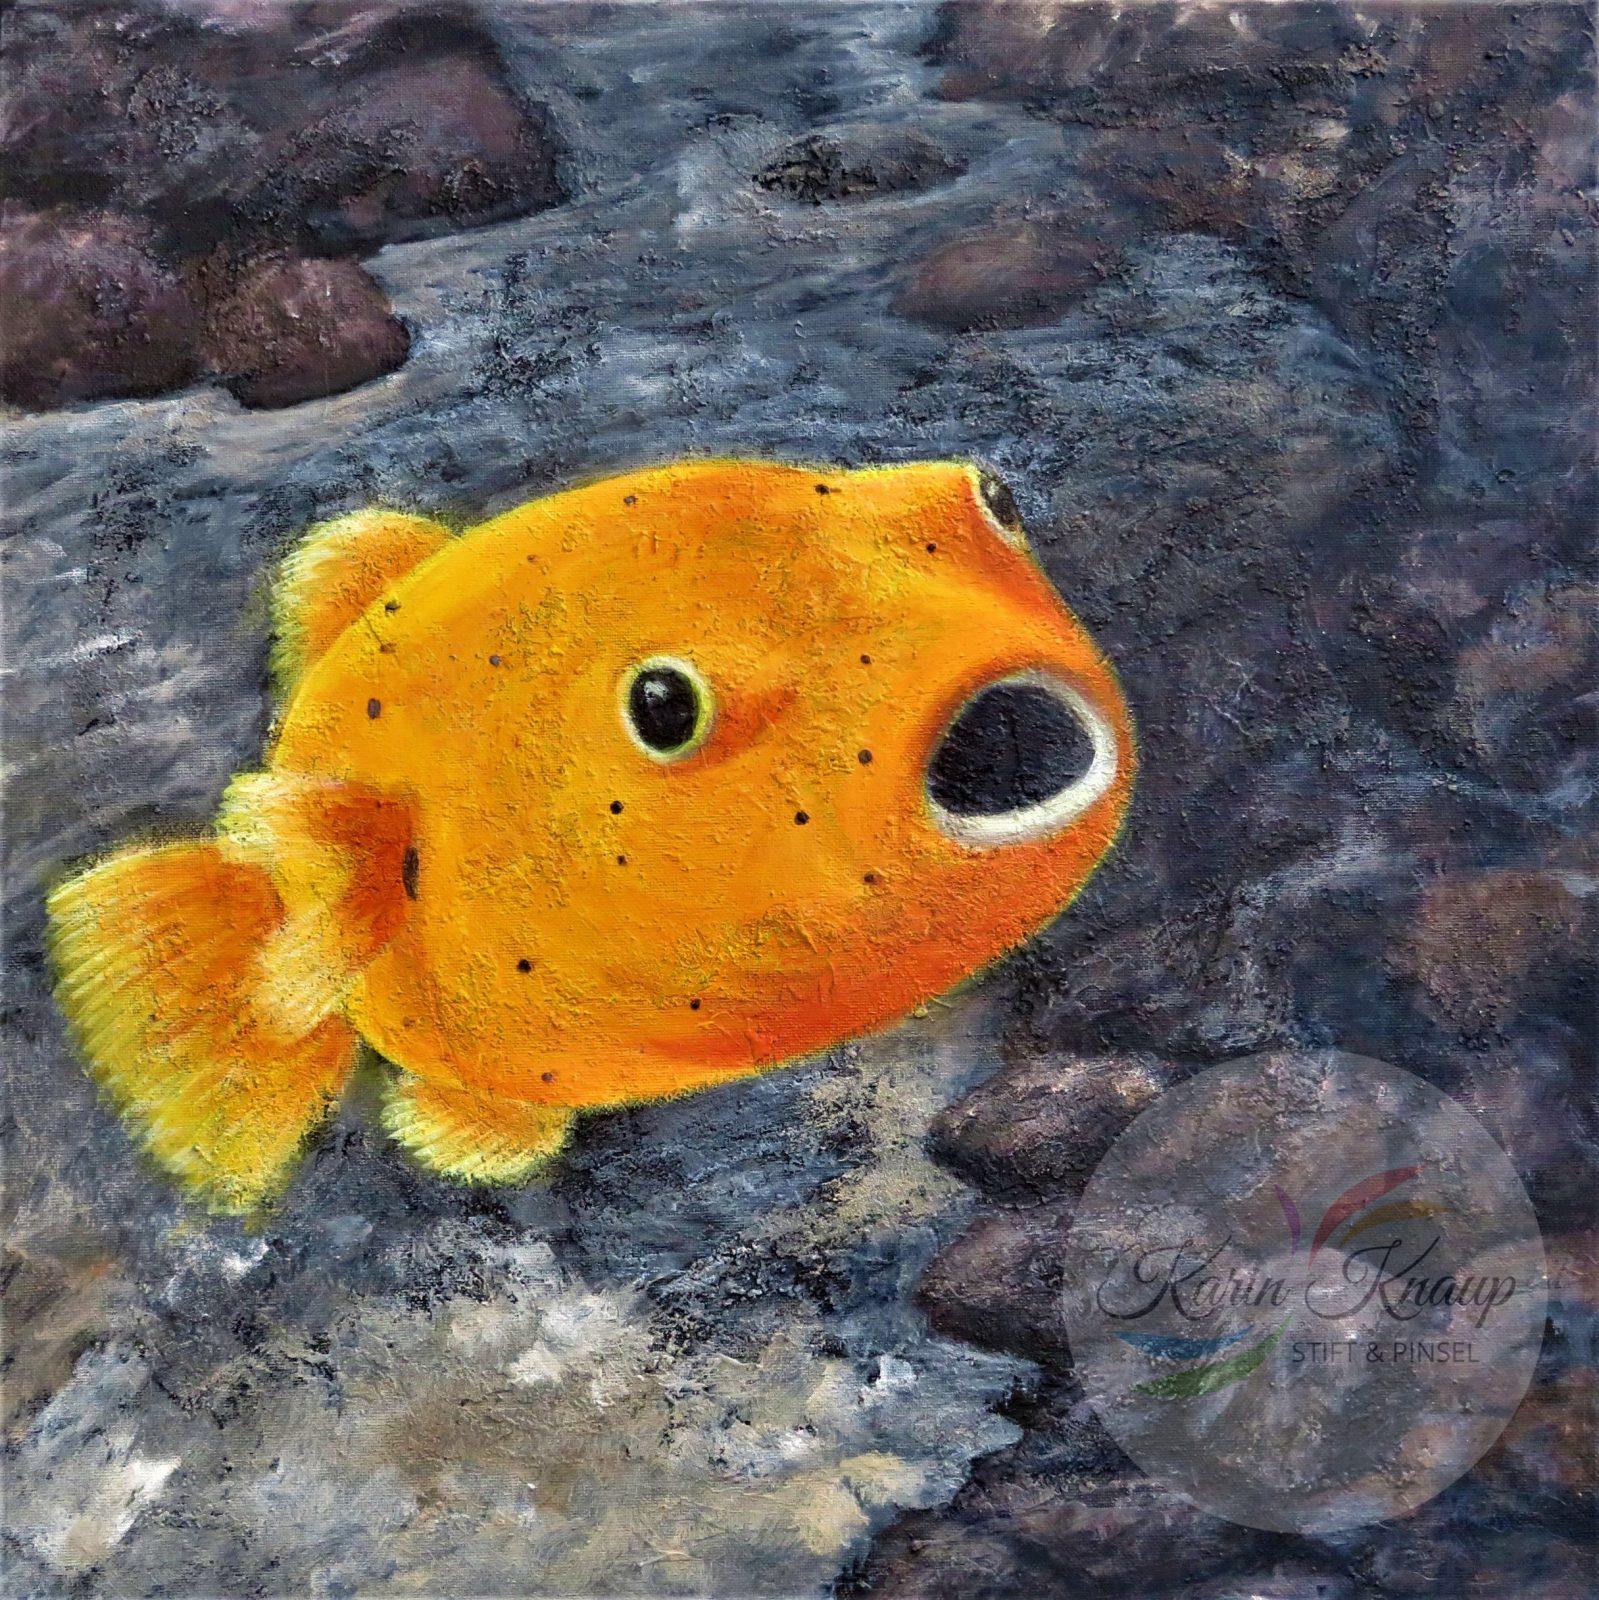 Kugelfisch - Acryl auf Leinwand 50 x 50cm